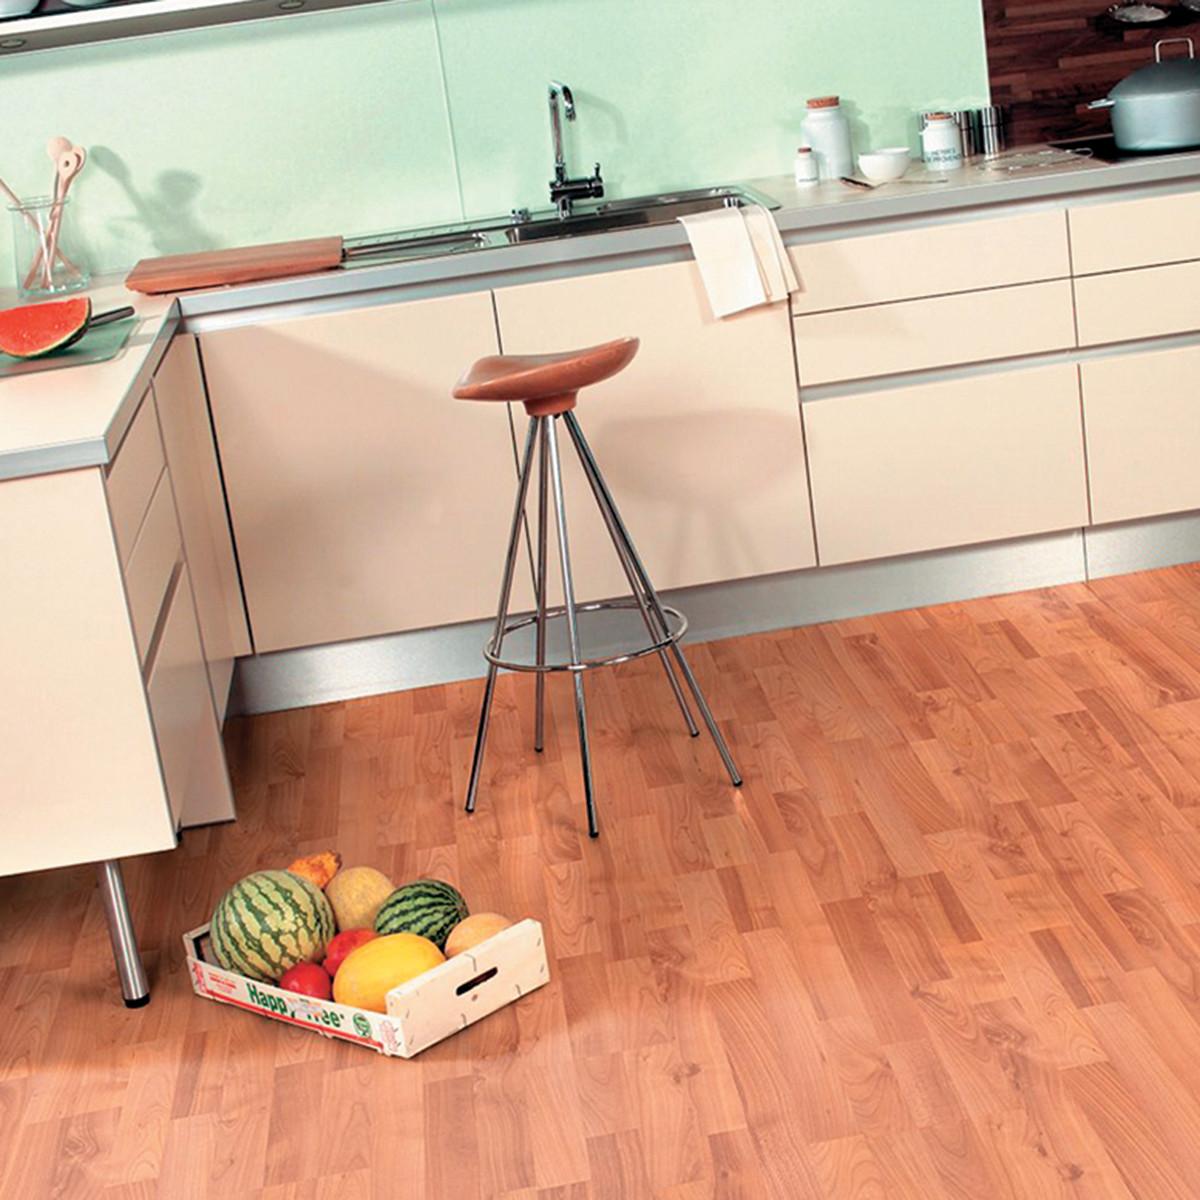 Parquet Per Bagno E Cucina. Gallery Of Parquet Per Cucina With ...